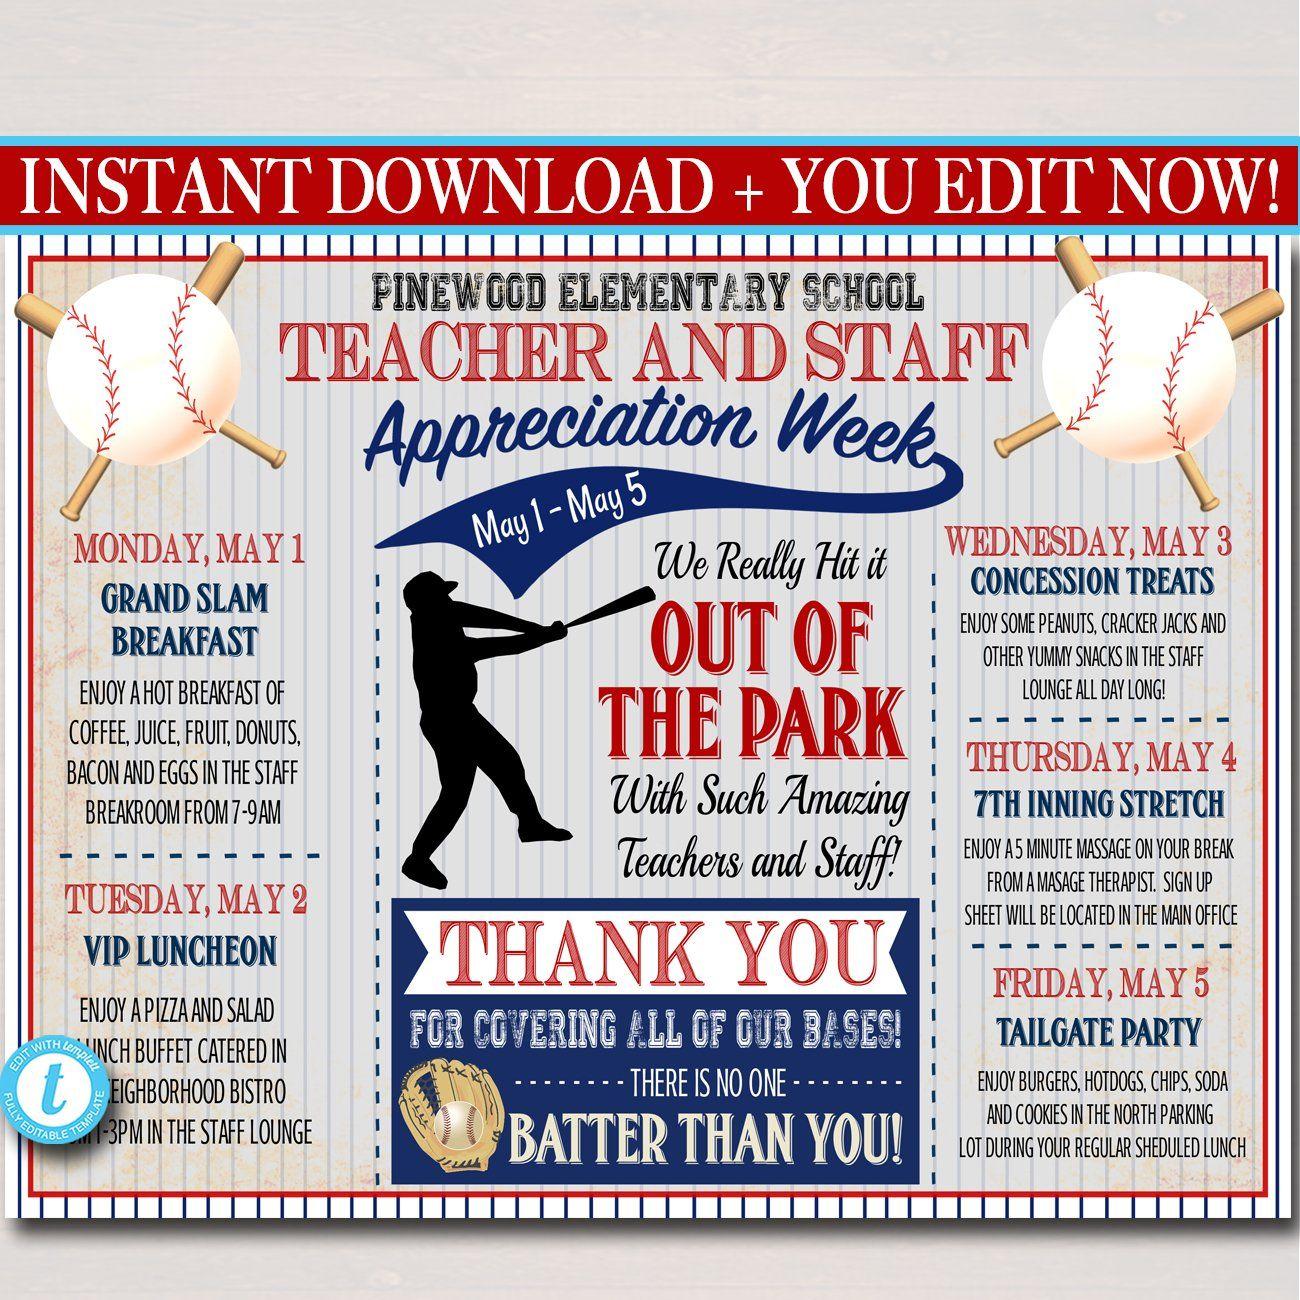 Baseball Themed Teacher Appreciation Week Itinerary Poster Printable In 2020 Staff Appreciation Week Teacher Appreciation Themes Teacher Appreciation Week